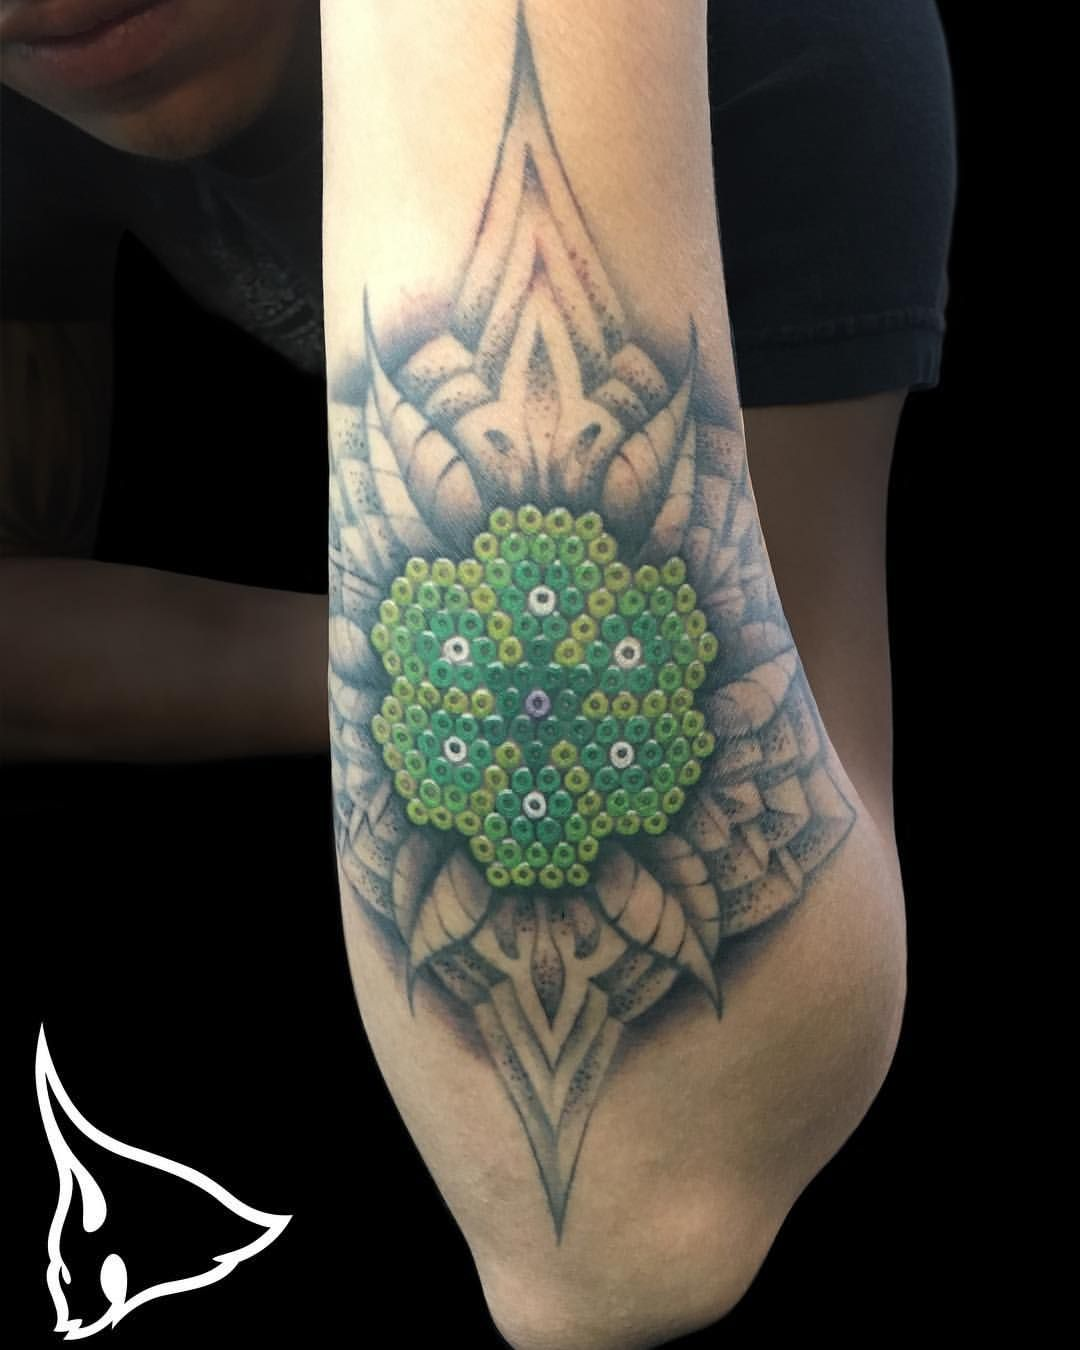 Tatuaje Ojo De Dios Huichol Wwwtollebildcom